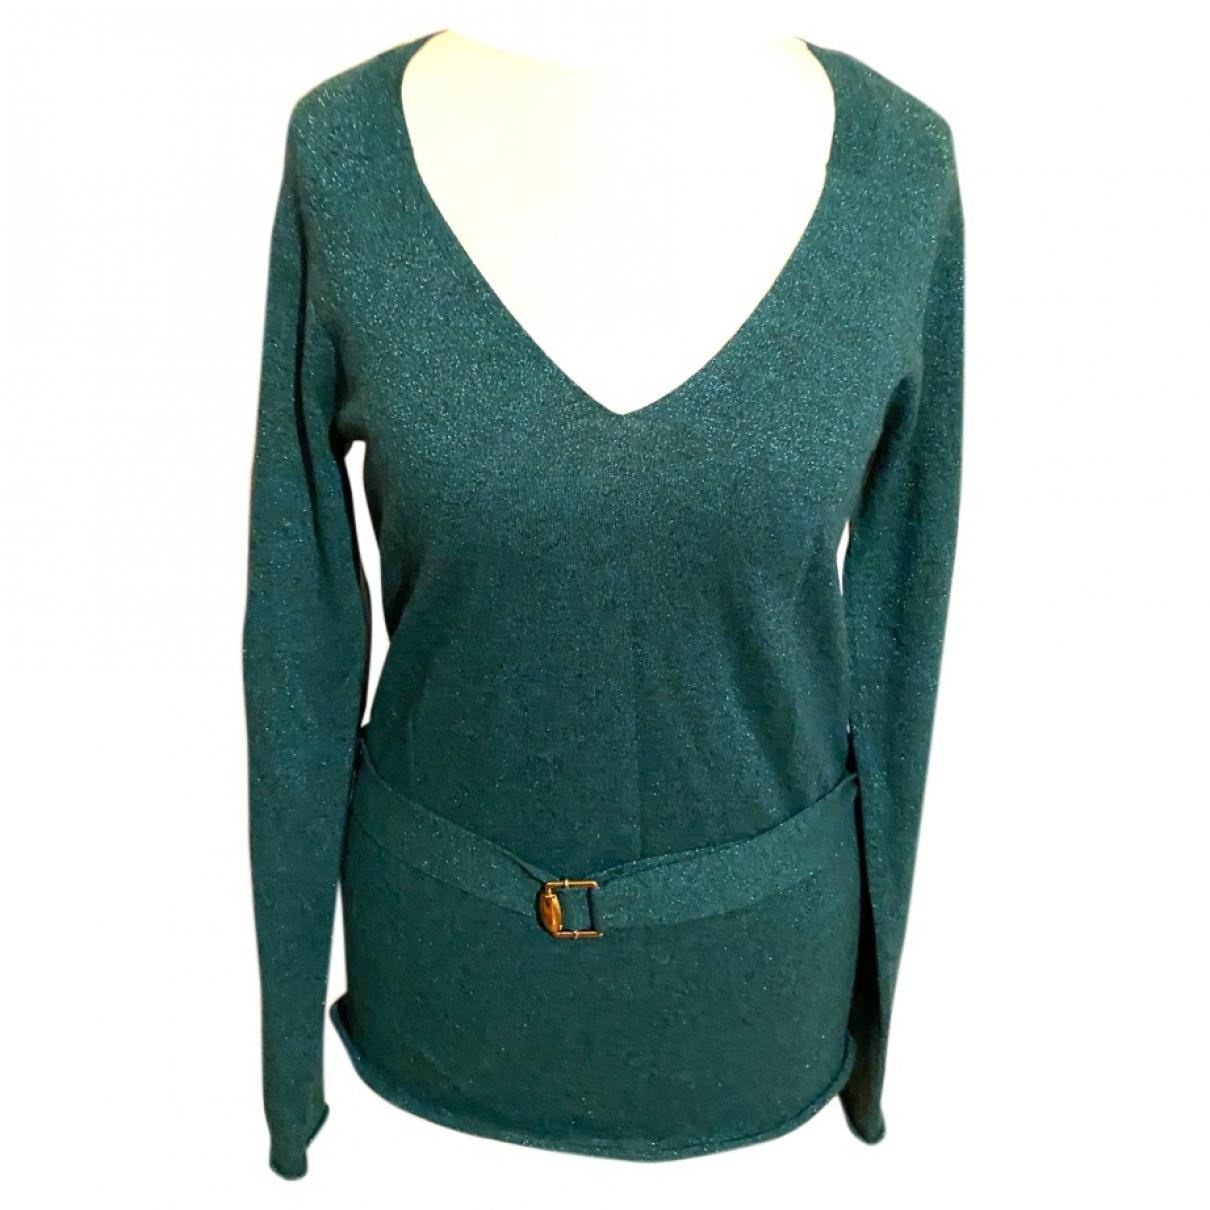 Gucci \N Green Cashmere Knitwear for Women M International